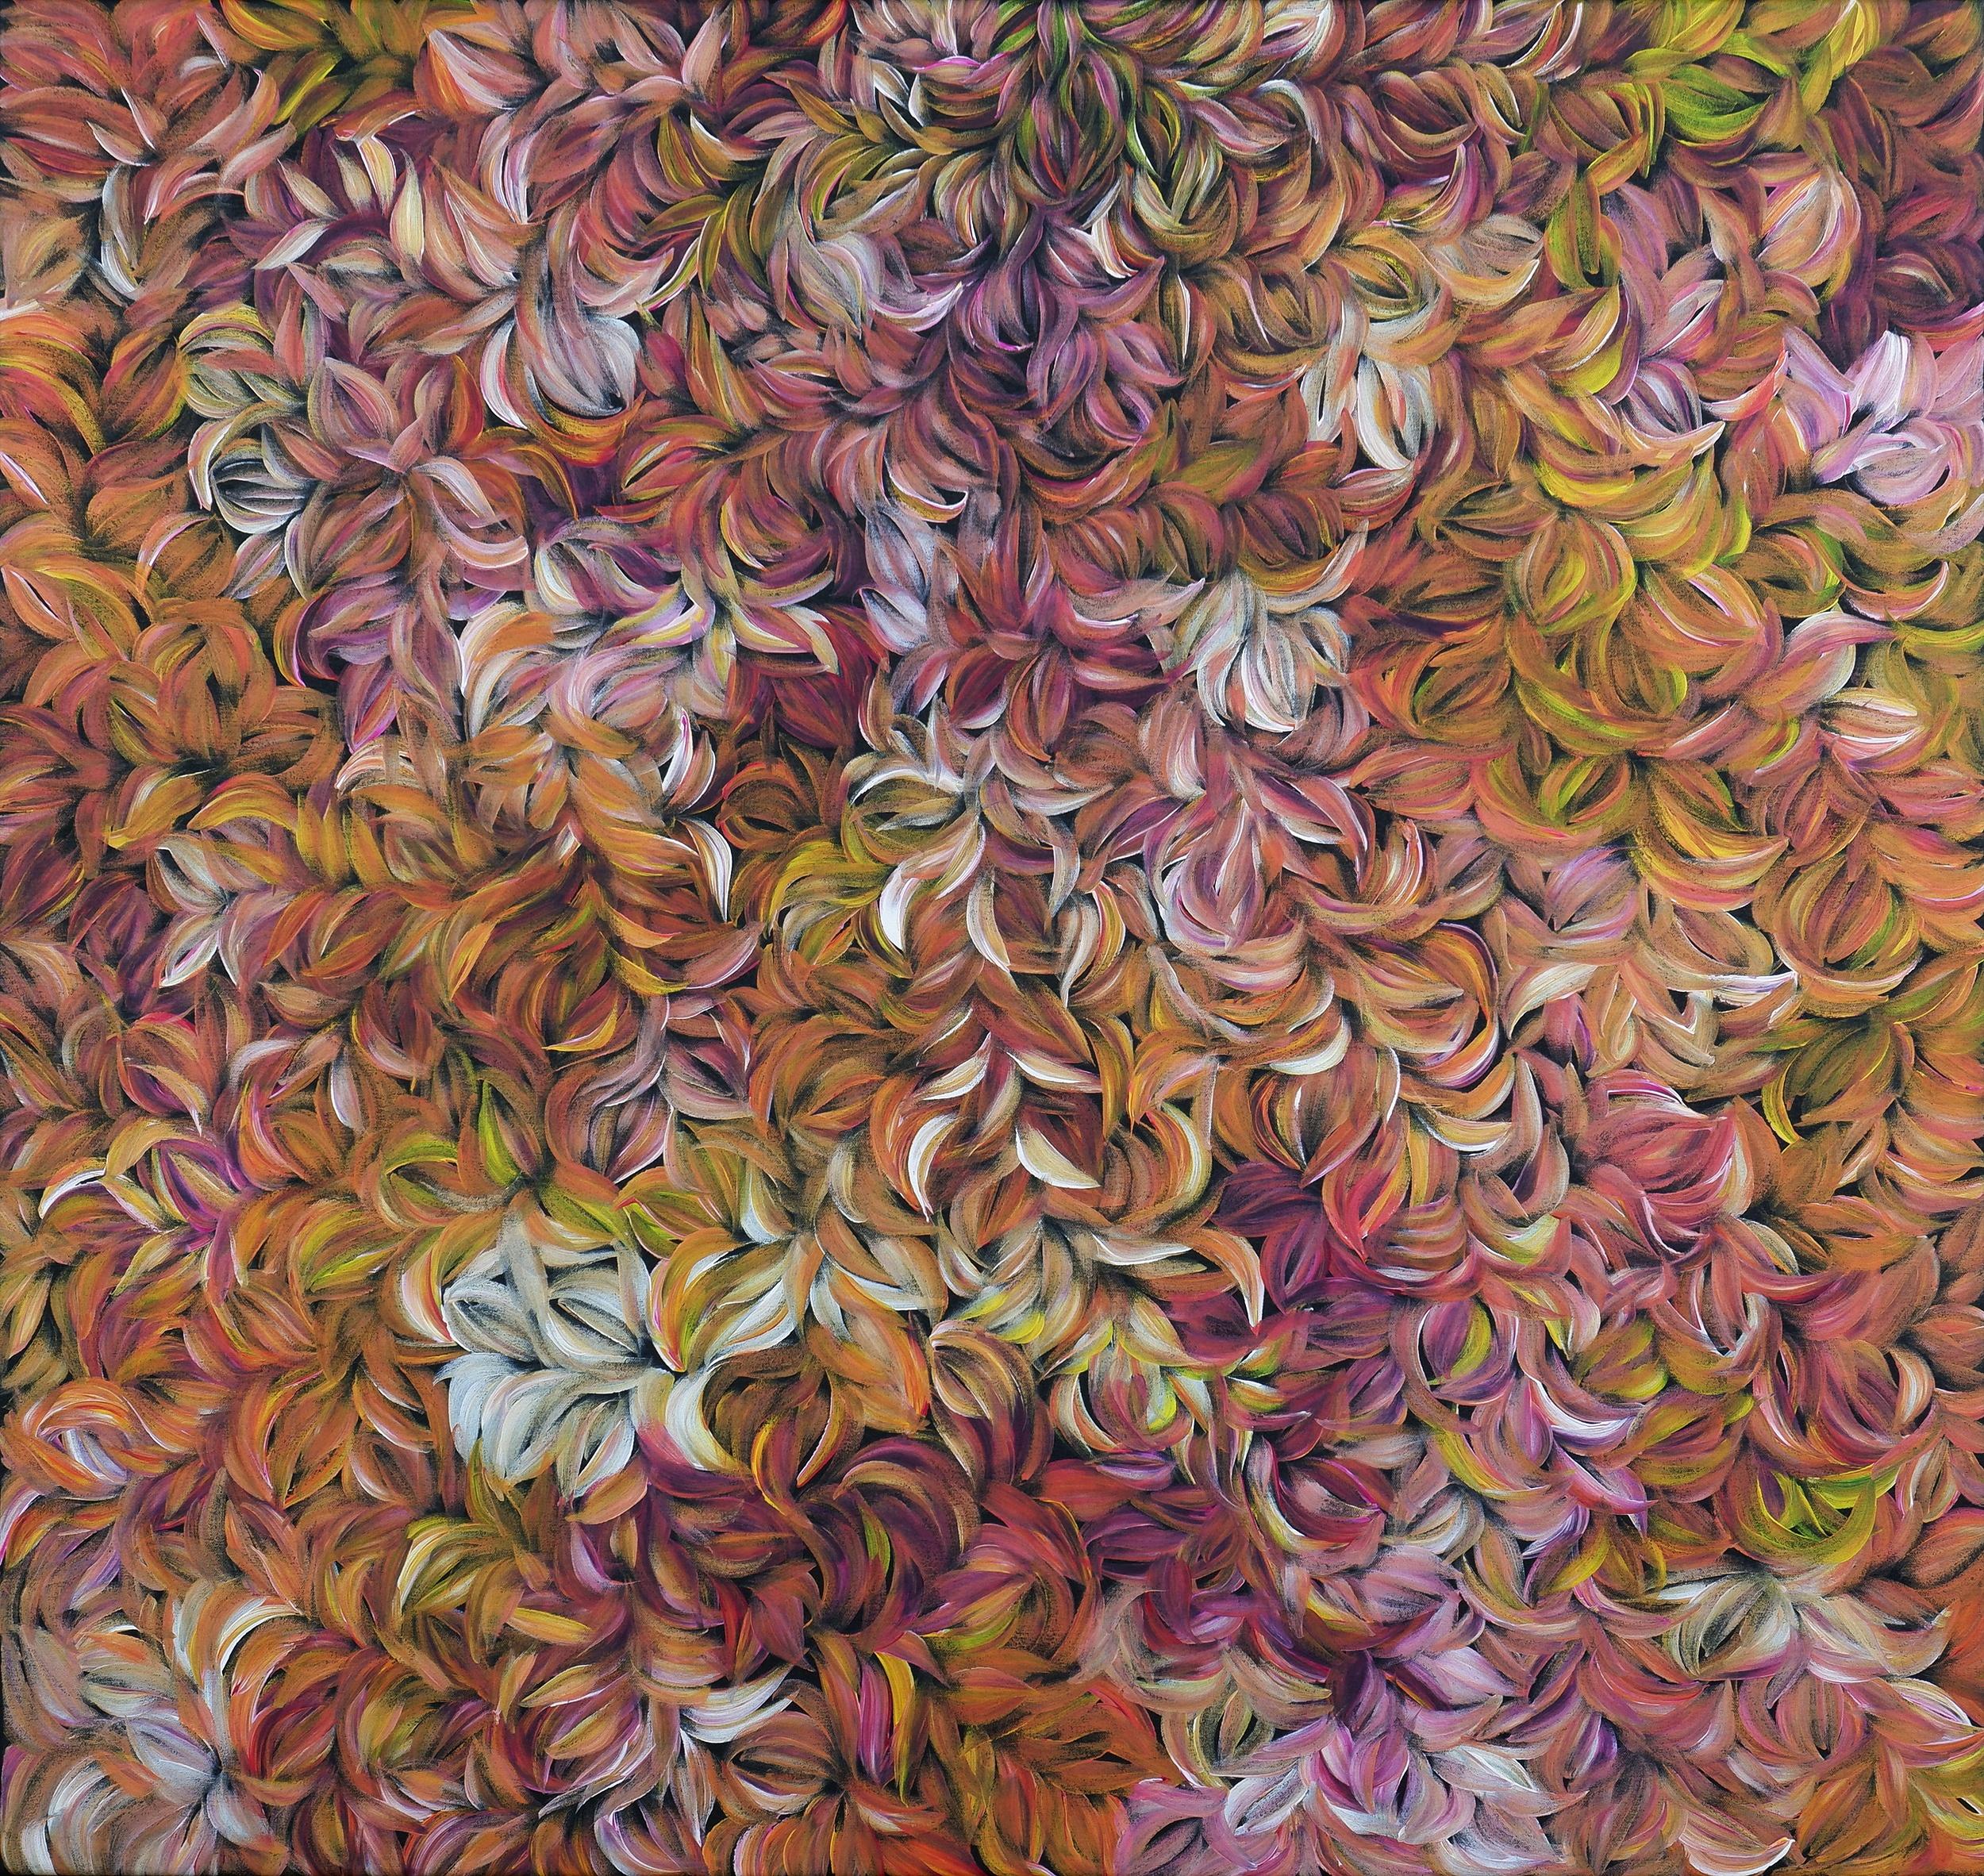 'Margaret Scobie (born c1948), Bush Medicine Leaves, Synthetic Polymer Paint on Canvas'